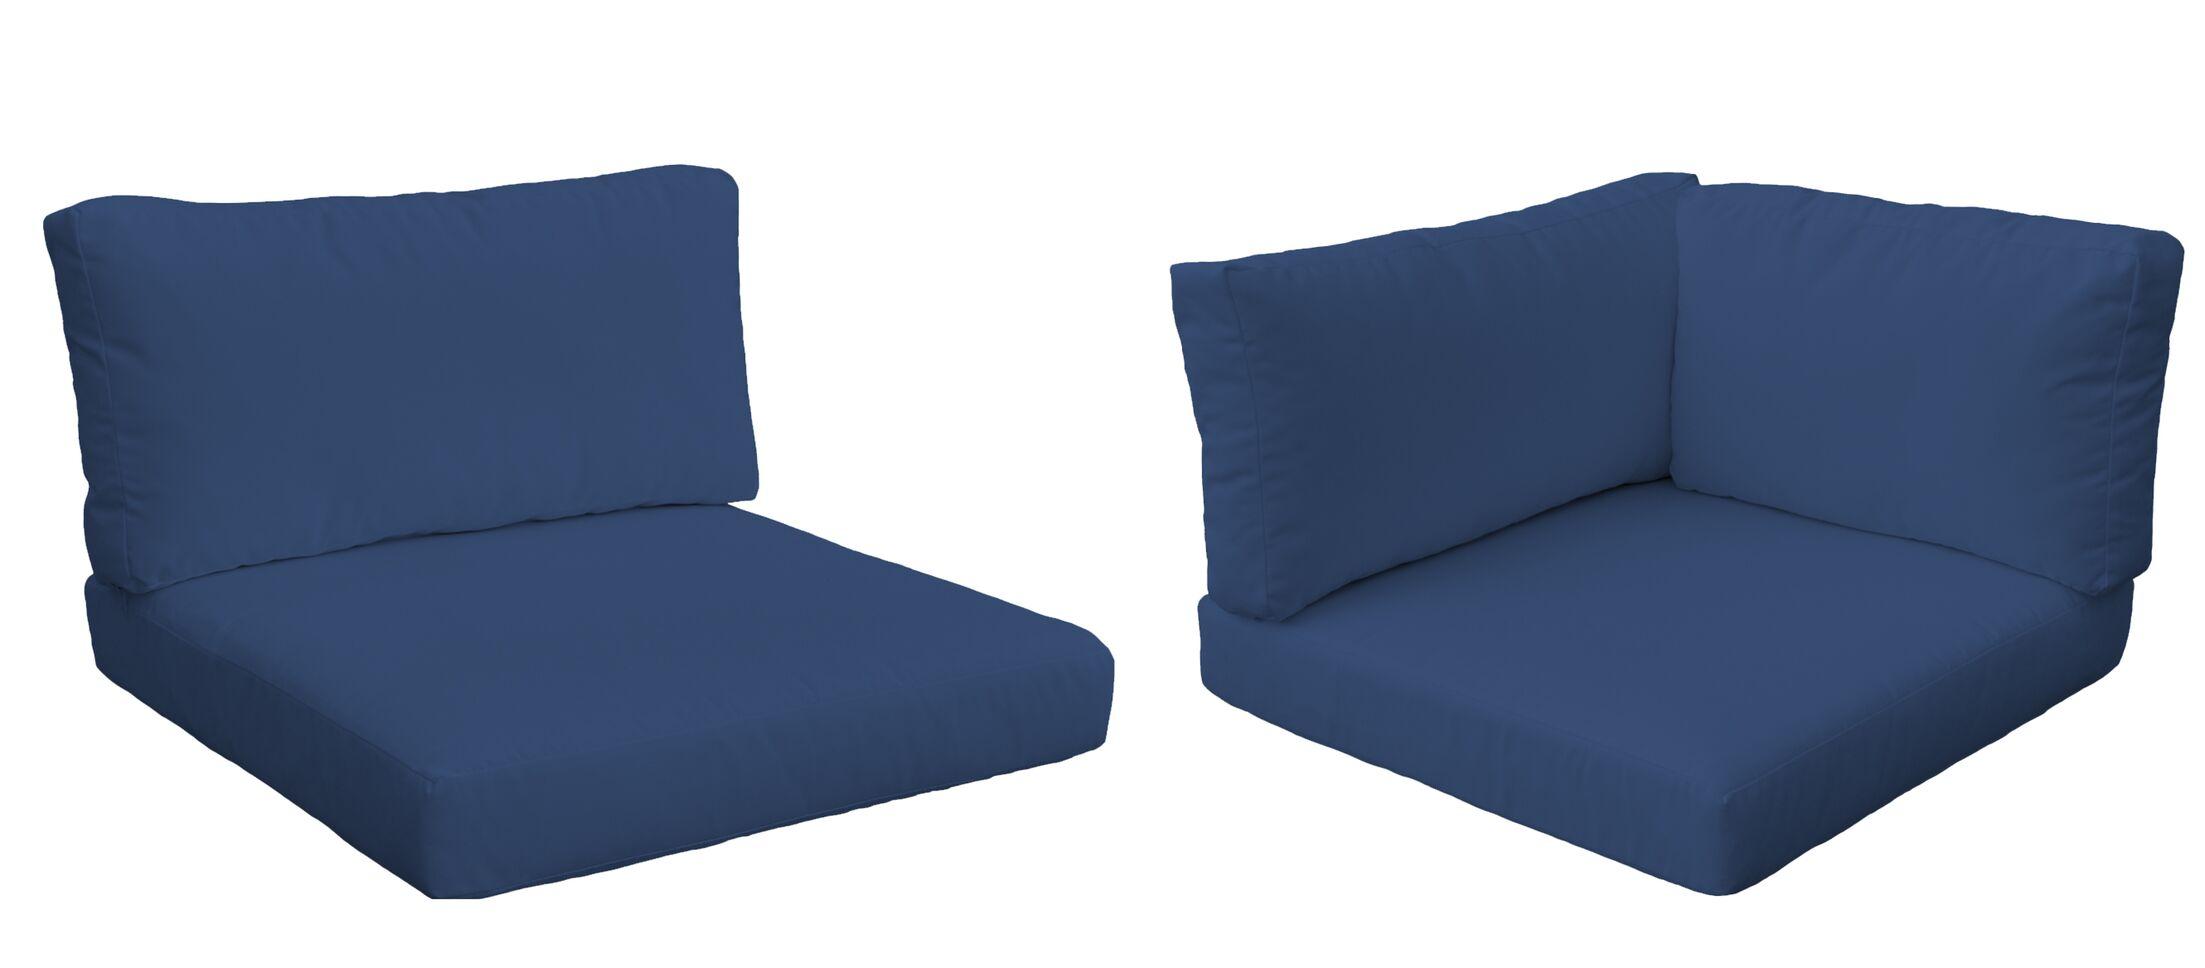 Monaco Outdoor 12 Piece Lounge Chair Cushion Set Fabric: Navy